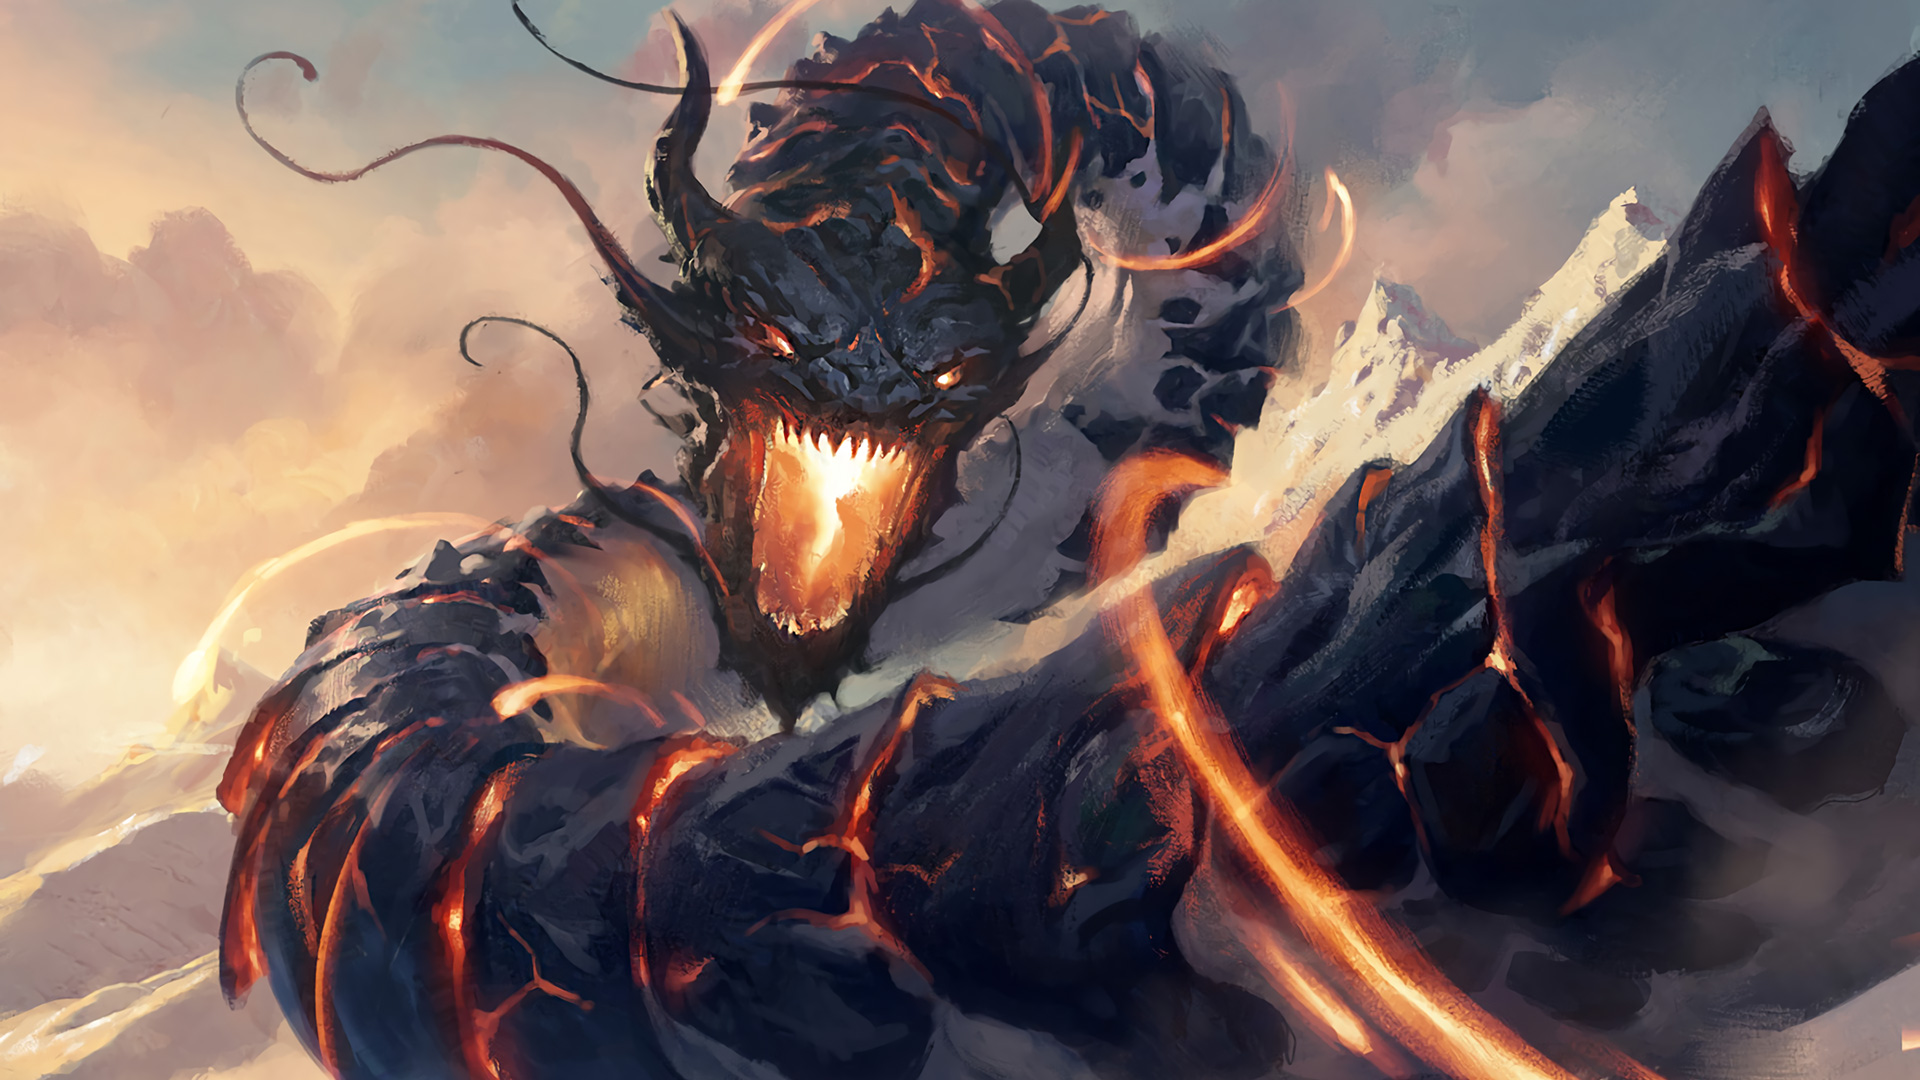 Dragon Fantasy Art, HD Artist, 4k Wallpapers, Images ...